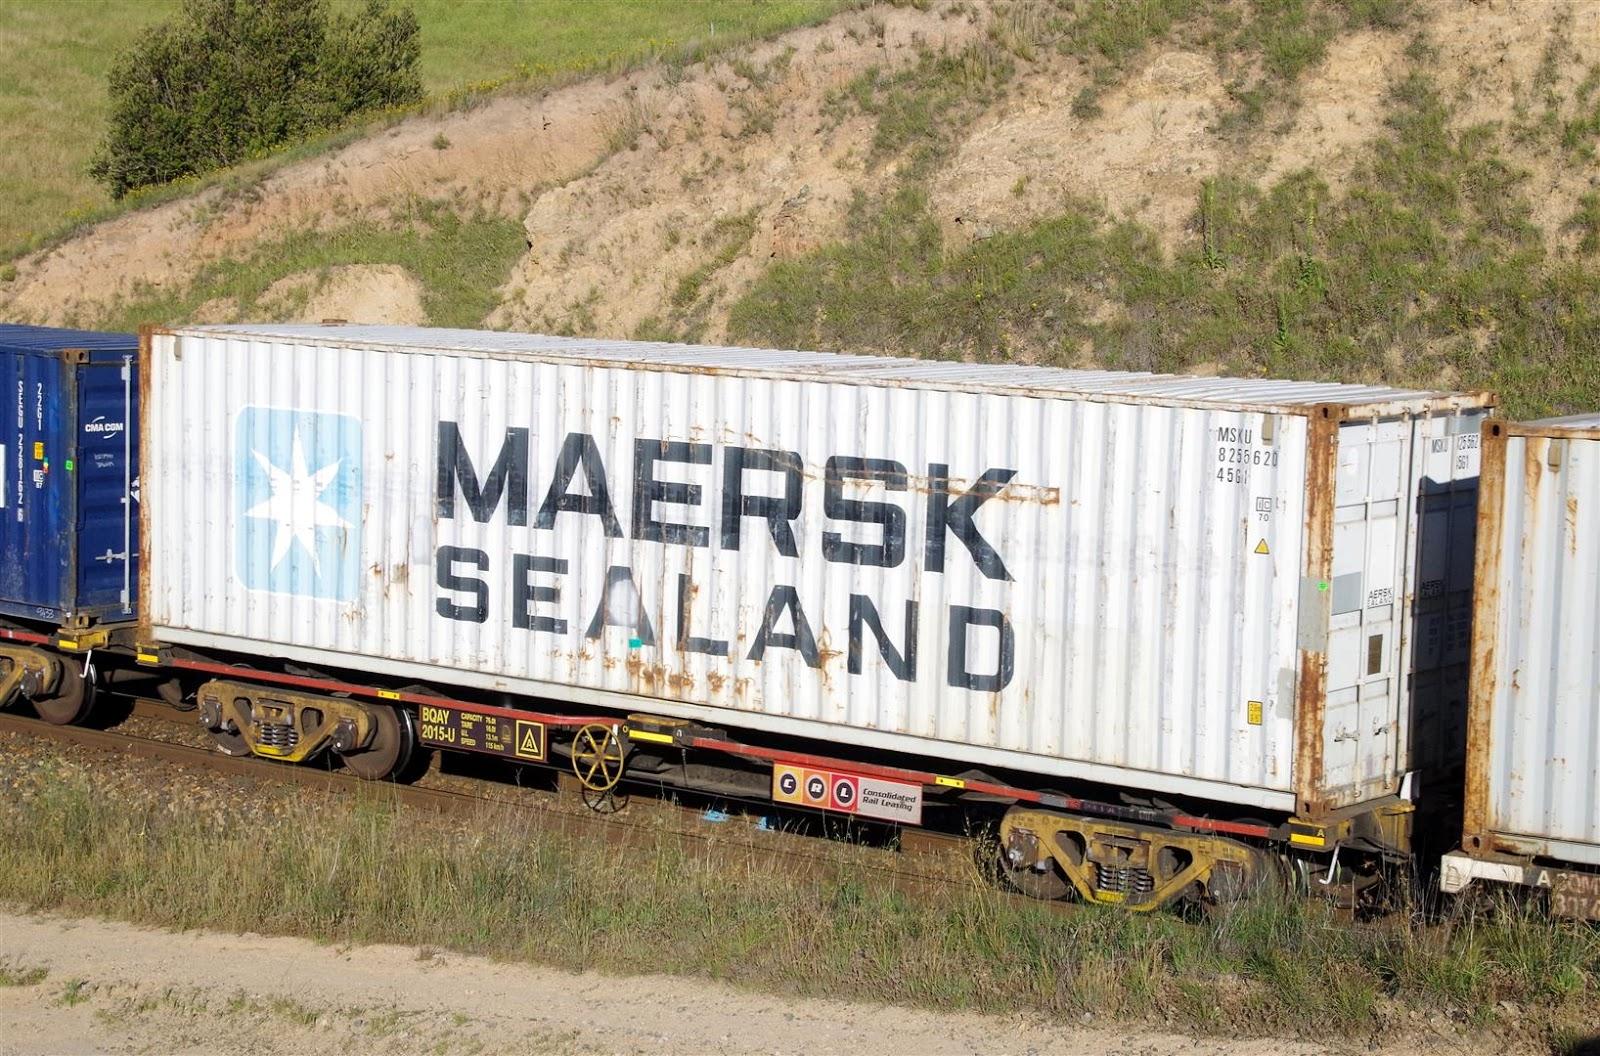 Rollingstock News: Battered Maersk Boxes